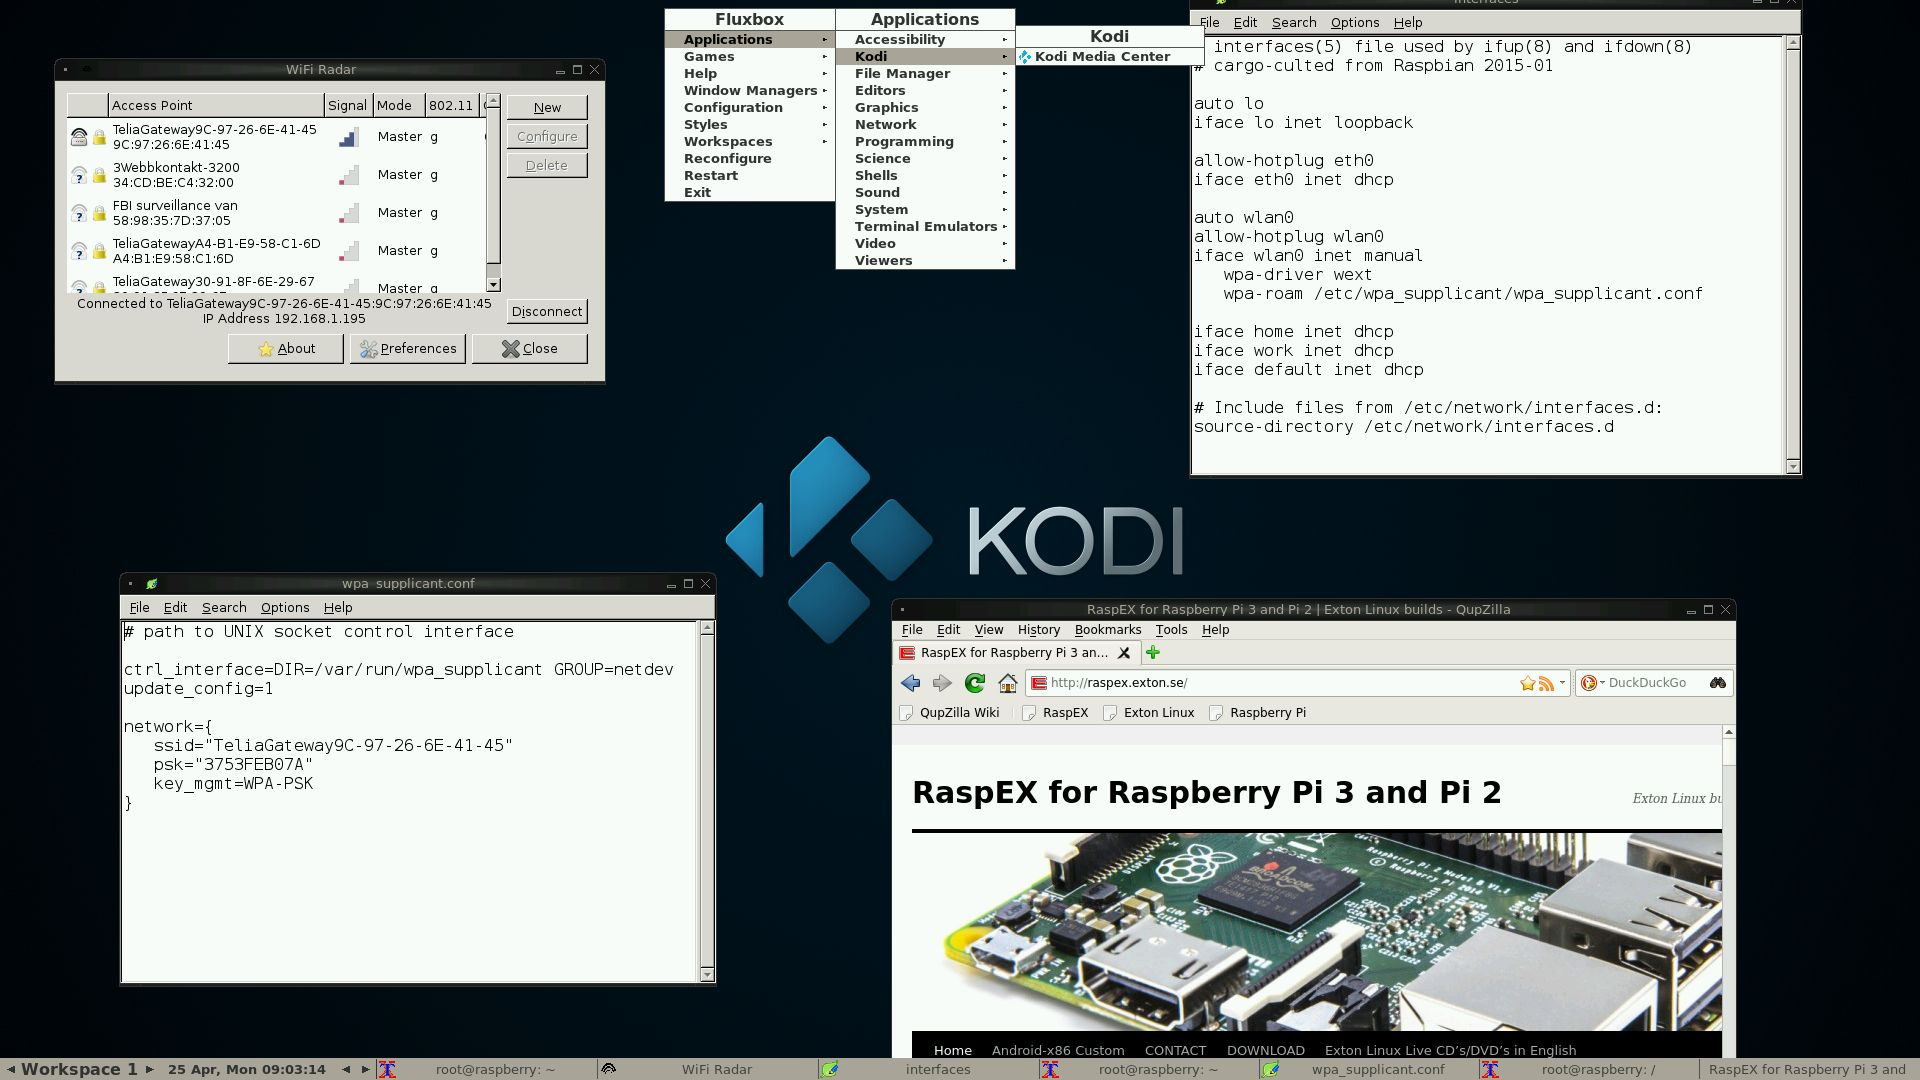 RaspEX, Ubuntu 16 04 for Raspberry Pi 3 and 2, Now Includes